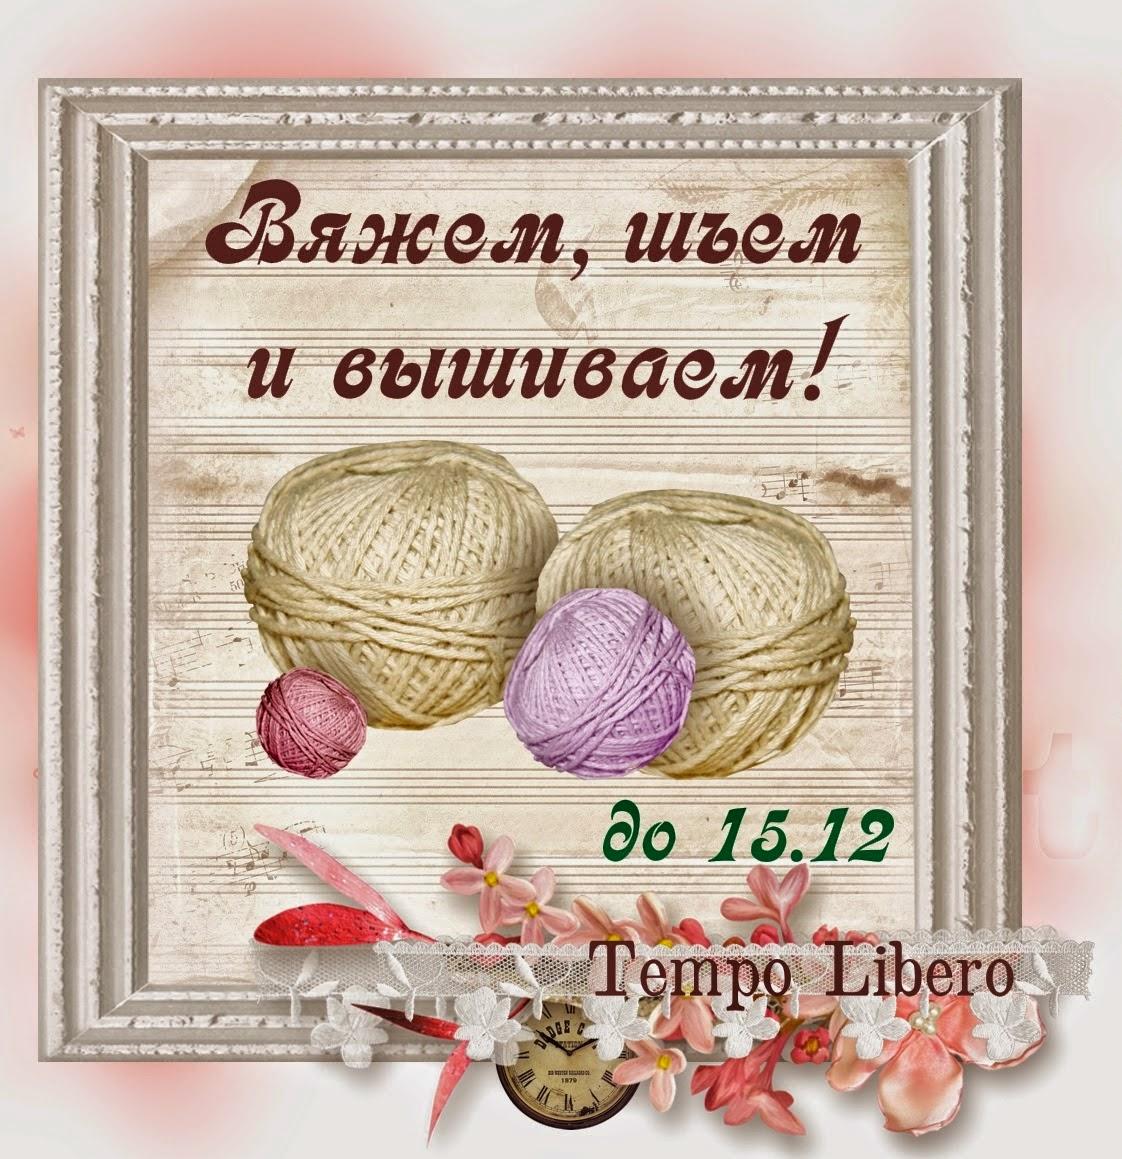 http://timelibero.blogspot.ru/2014/11/blog-post_16.html